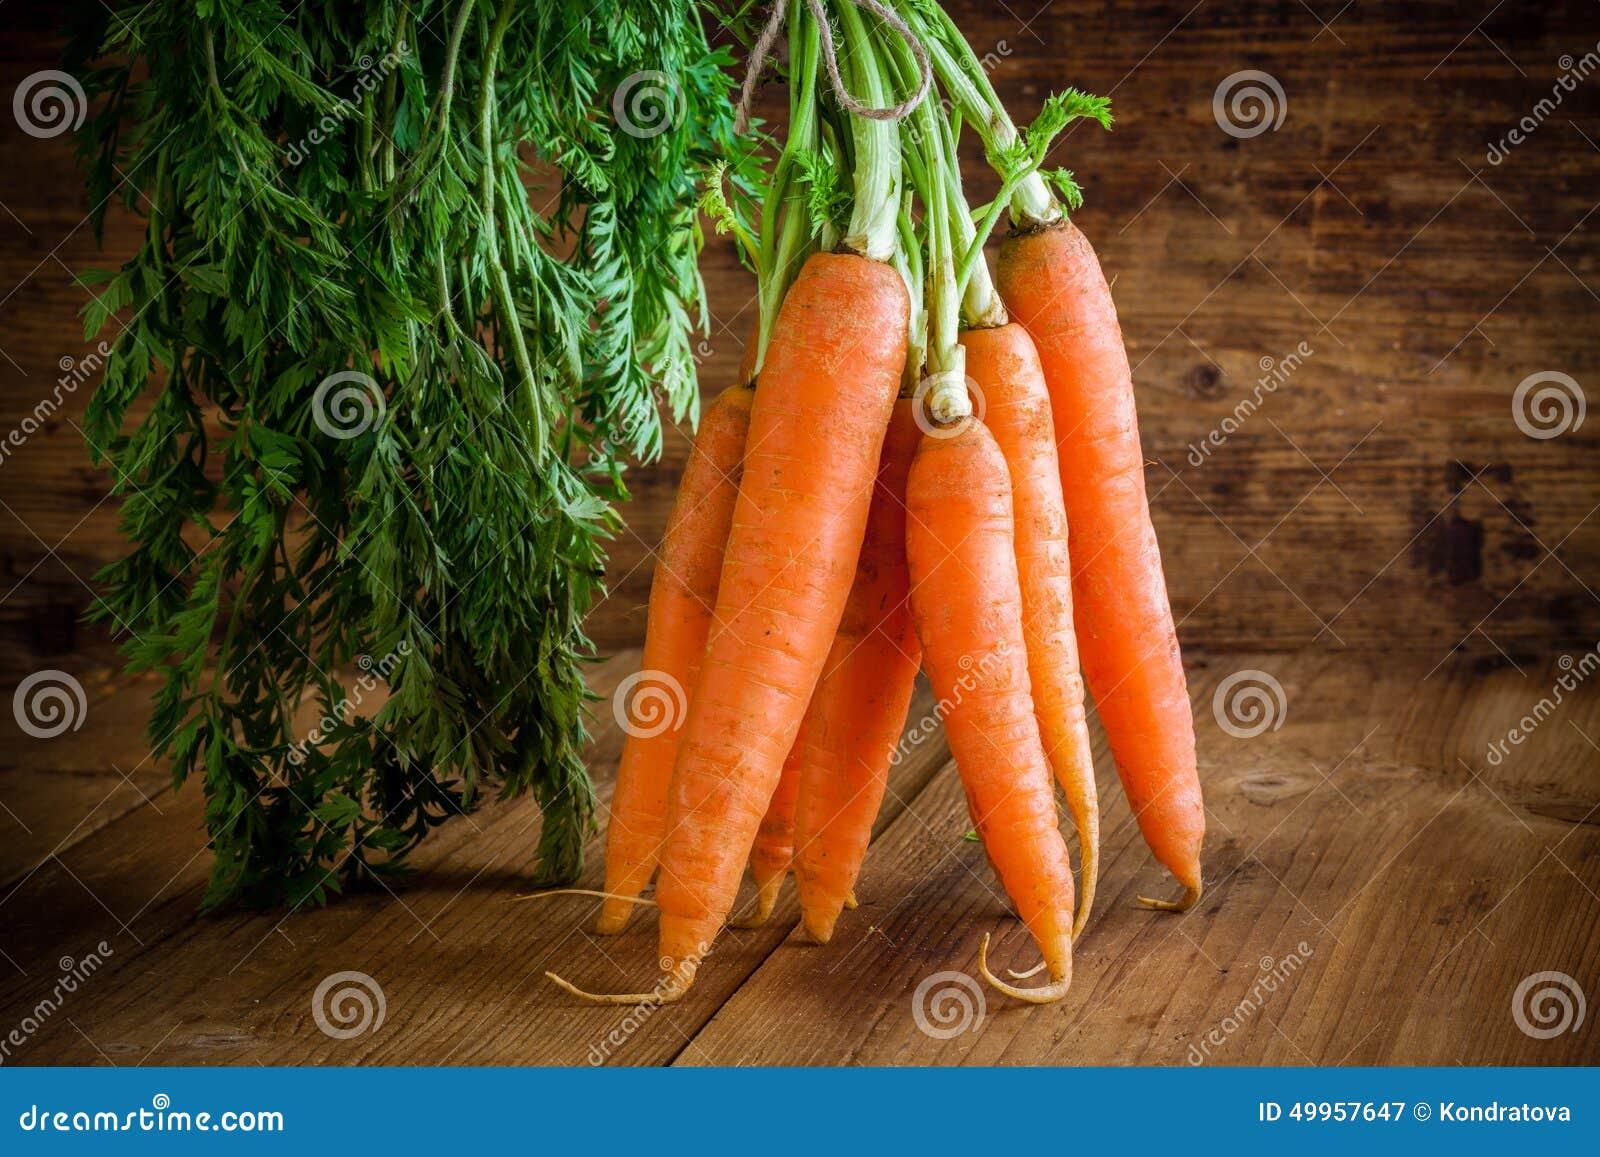 Fresh organic carrots bunch